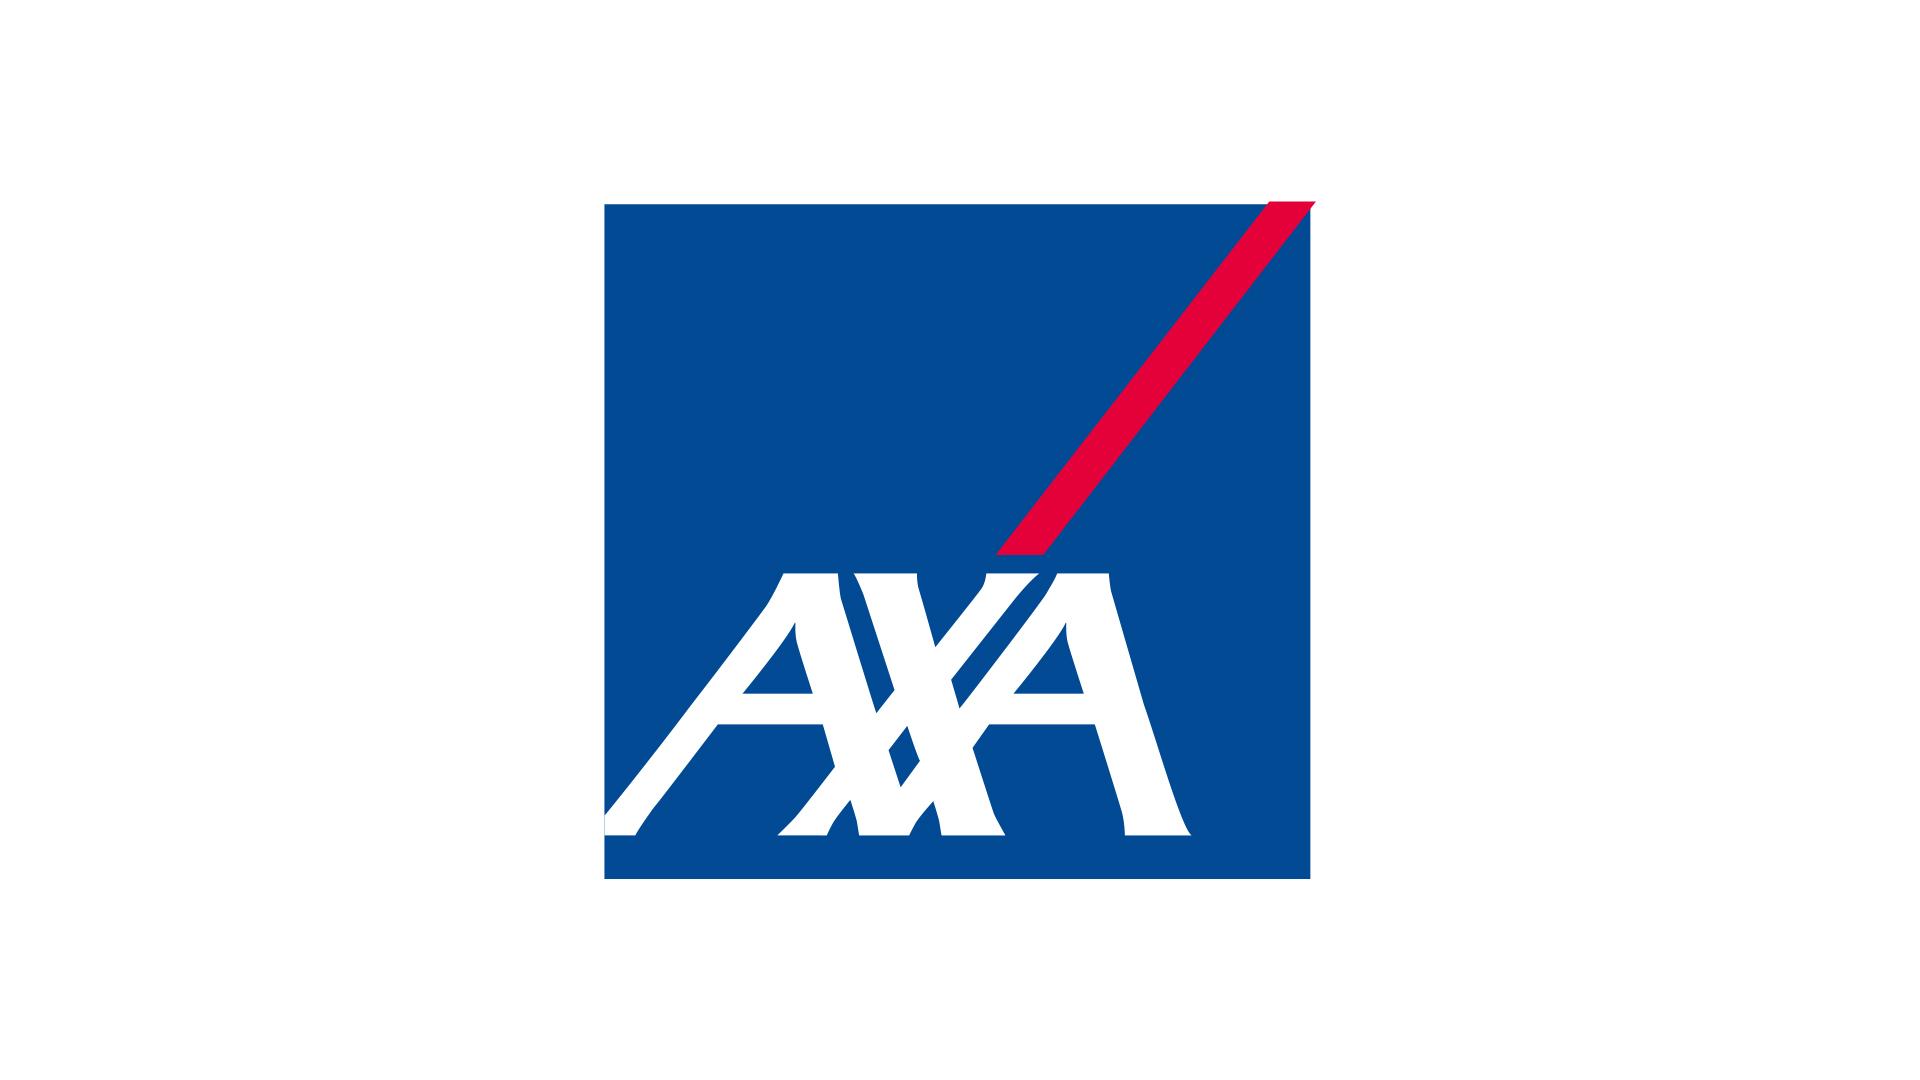 Logo Axa Aquilae